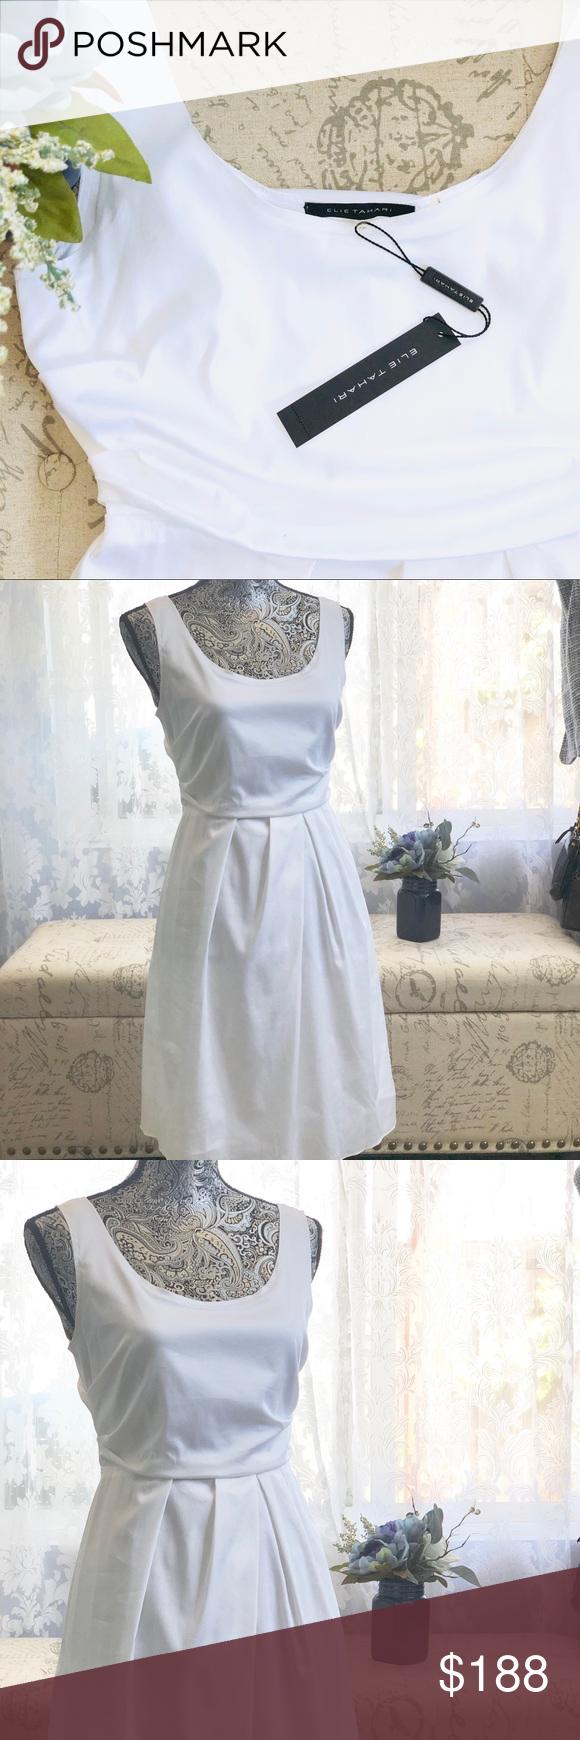 Nwt Elie Tahari White Sleeveless Riley Dress Elie Tahari Elie Tahari Dresses Tahari Dress [ 1740 x 580 Pixel ]